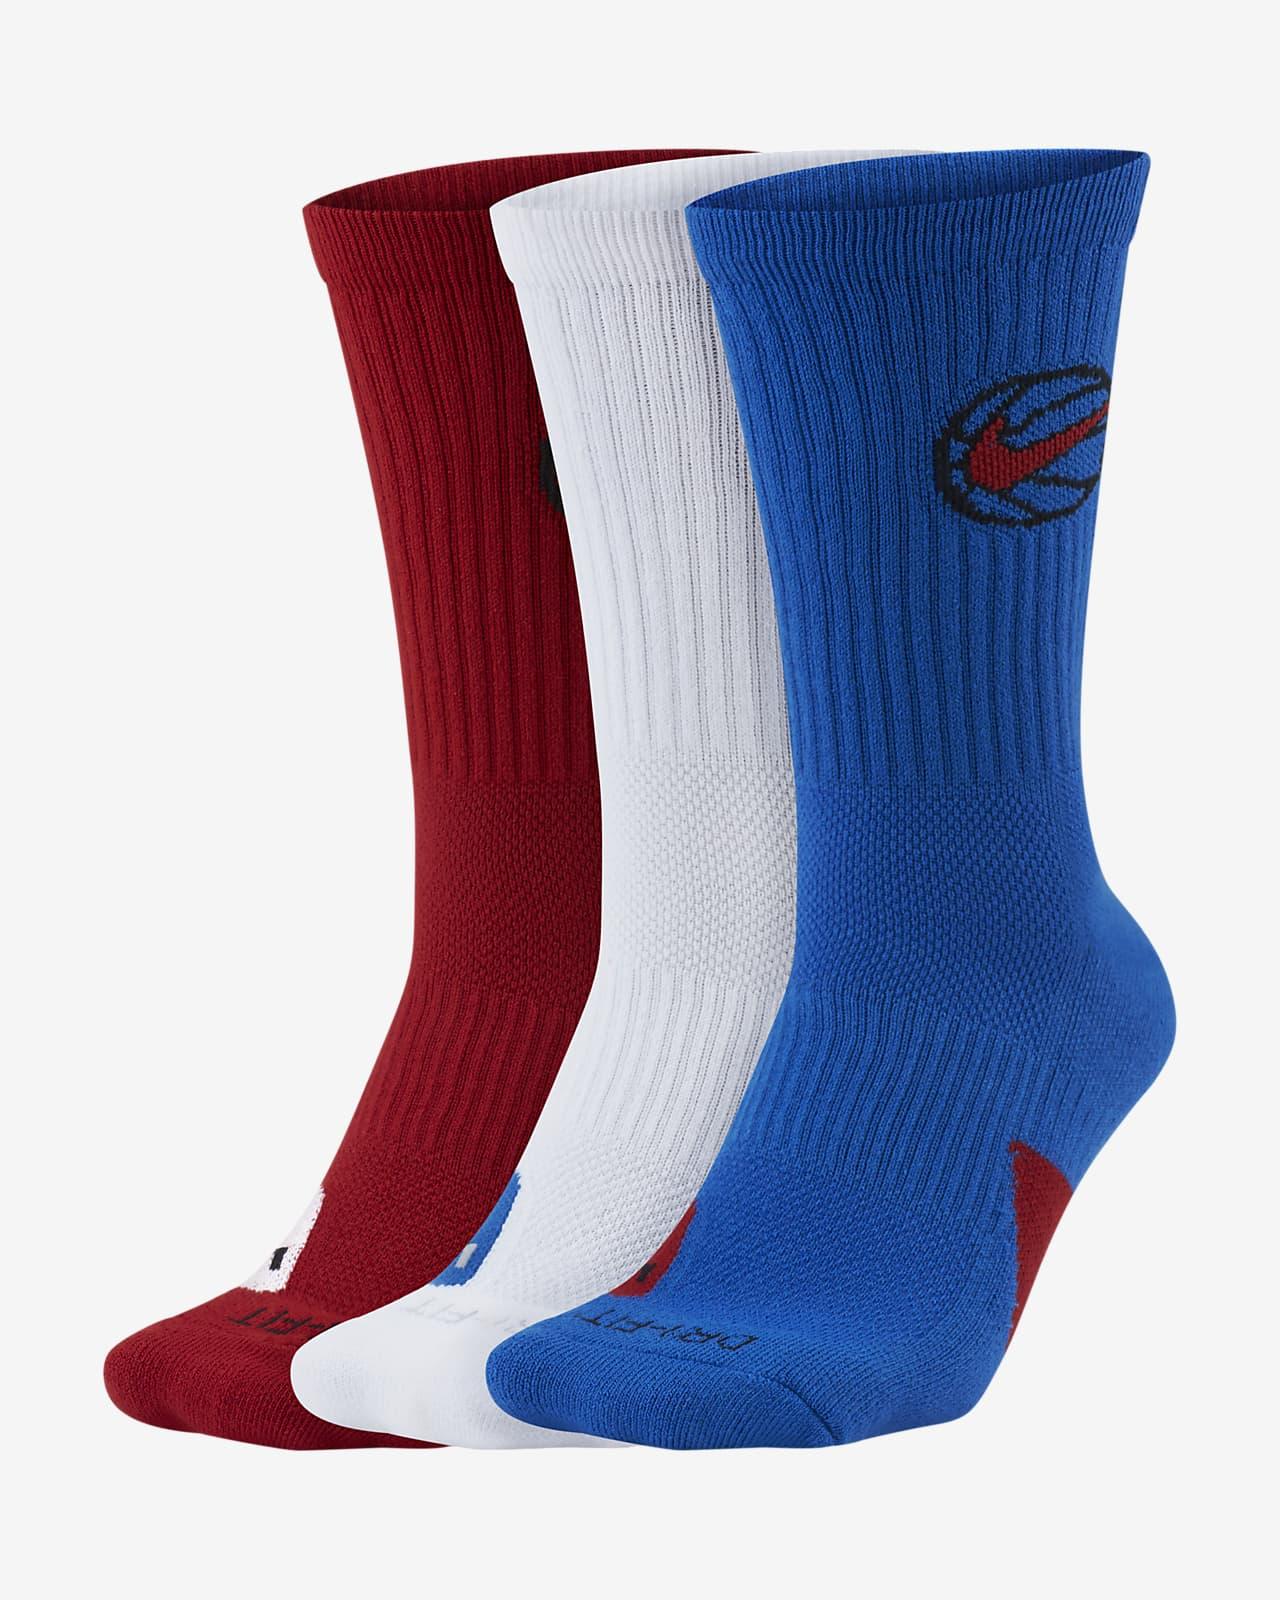 Nike Everyday Crew Basketball Socks (3 Pair)